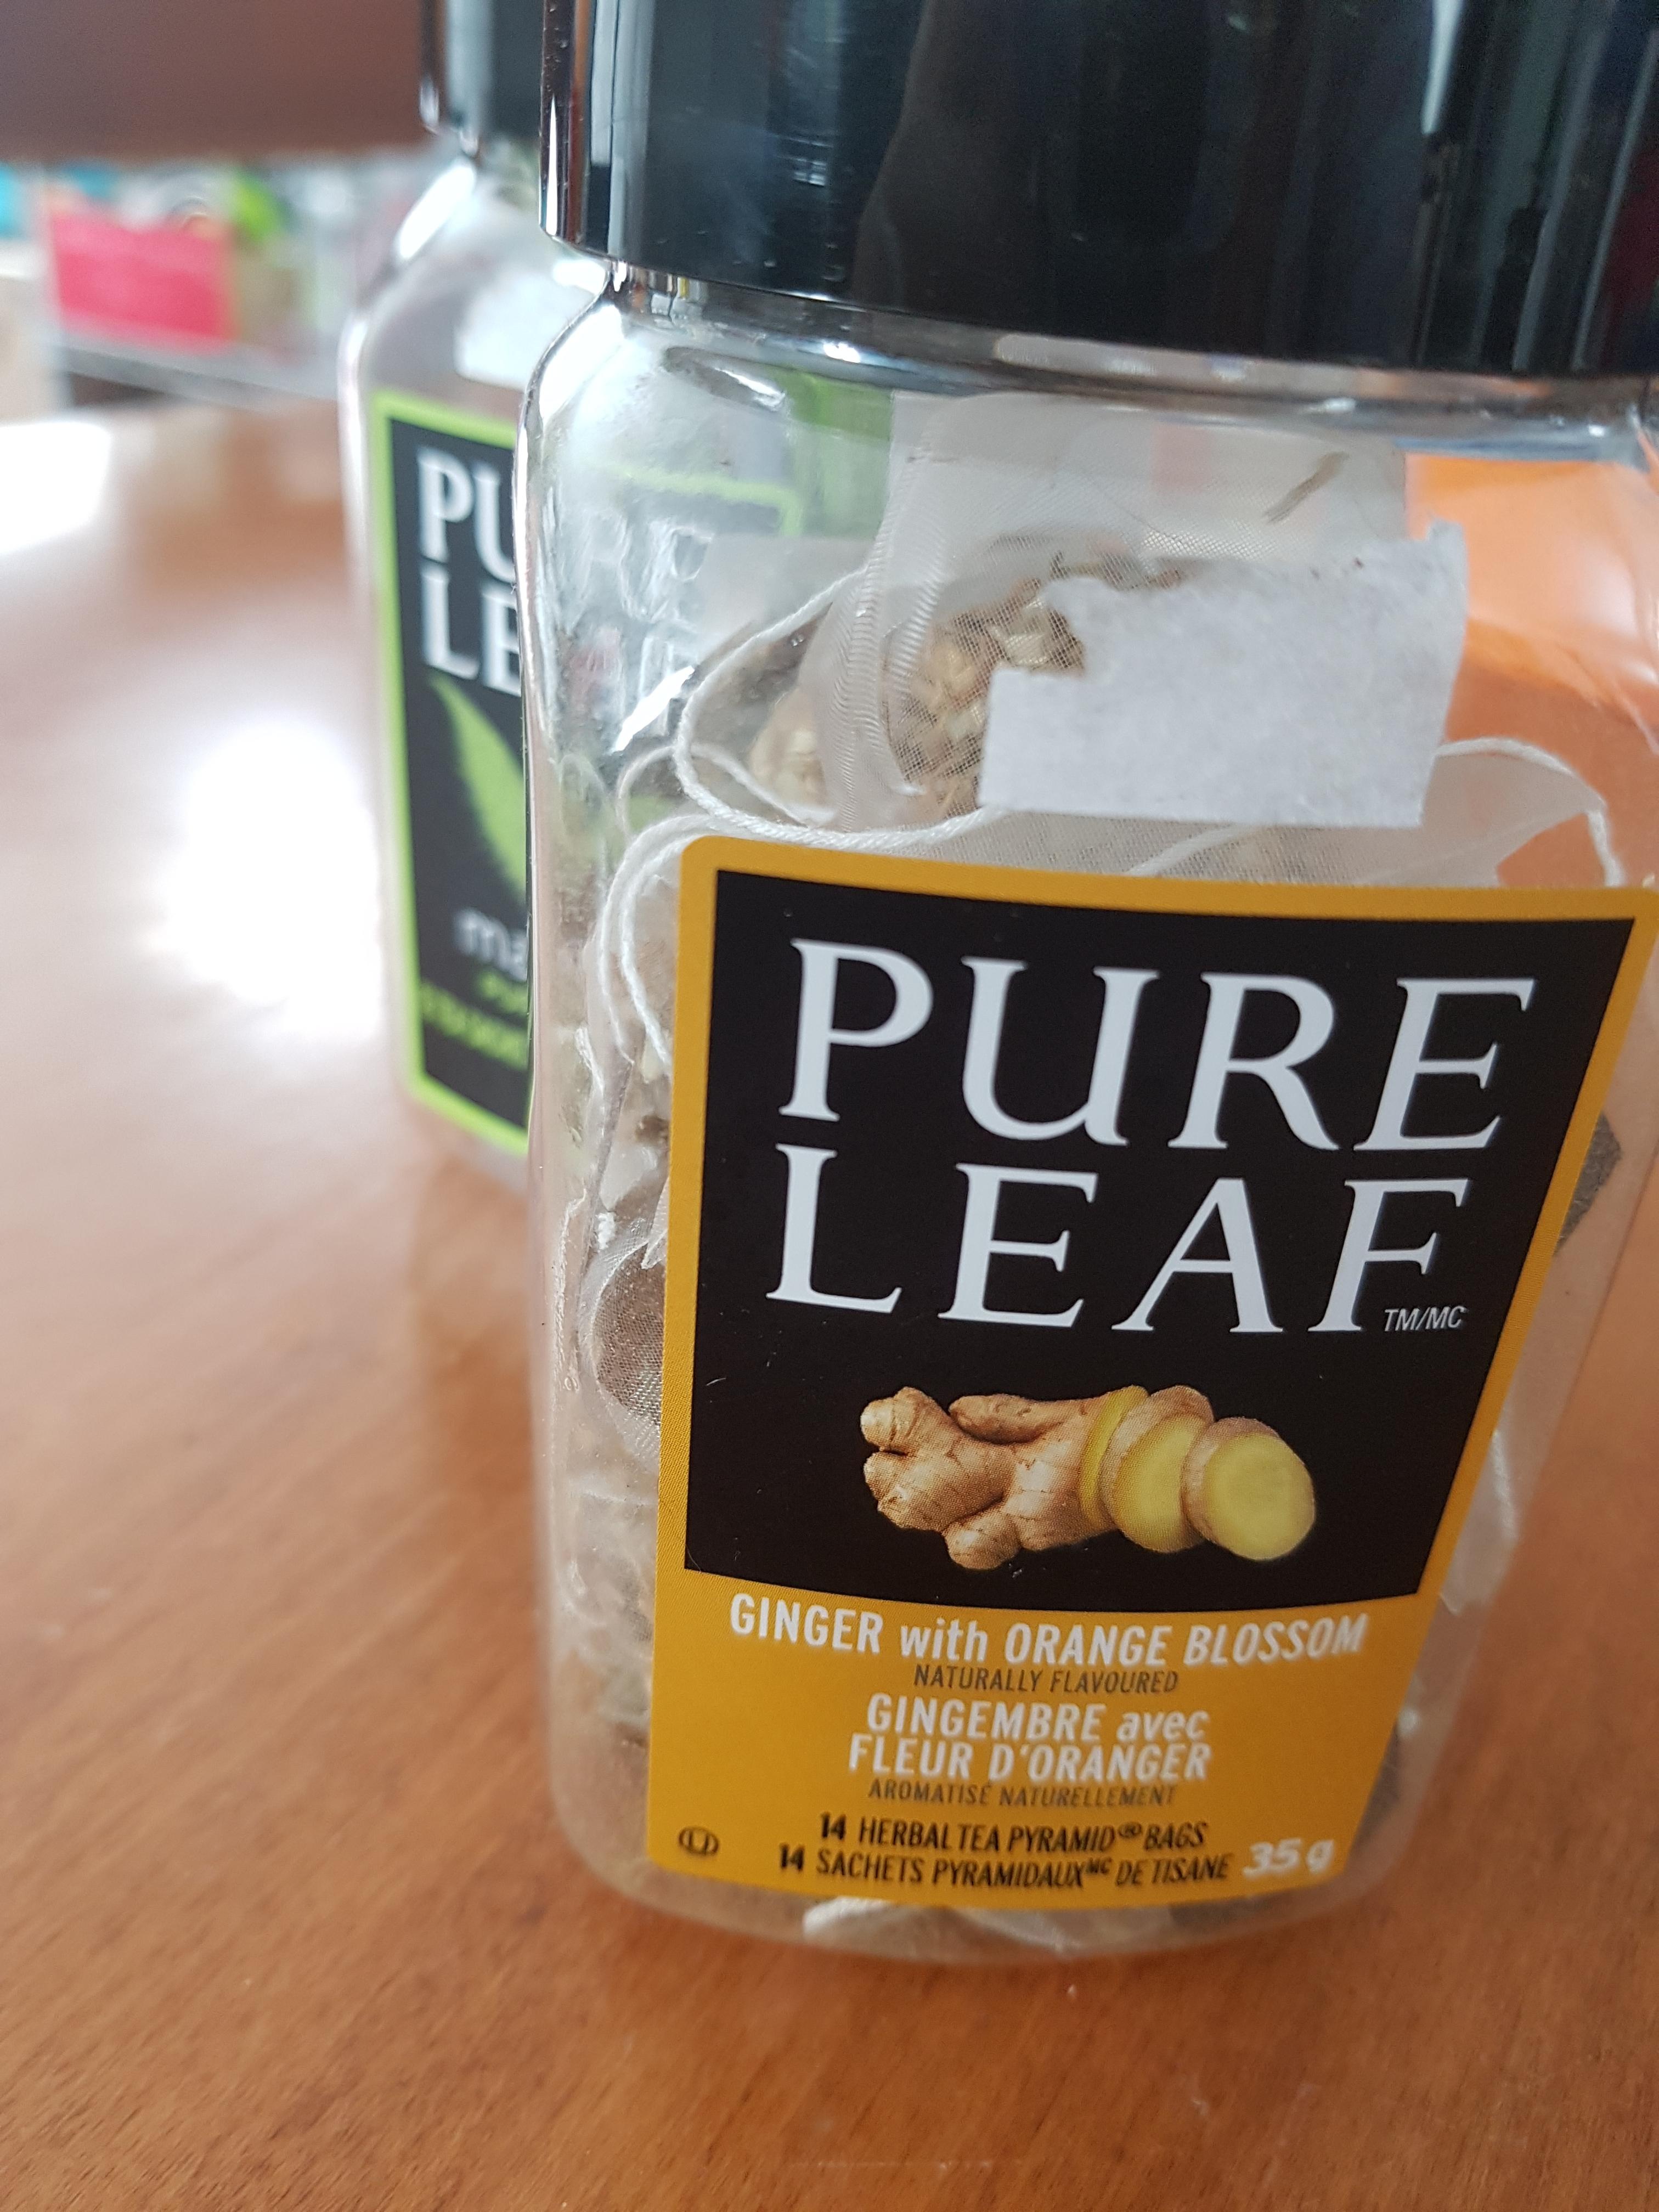 Pure Leaf Ginger with Orange Blossom pyramid tea bags ...